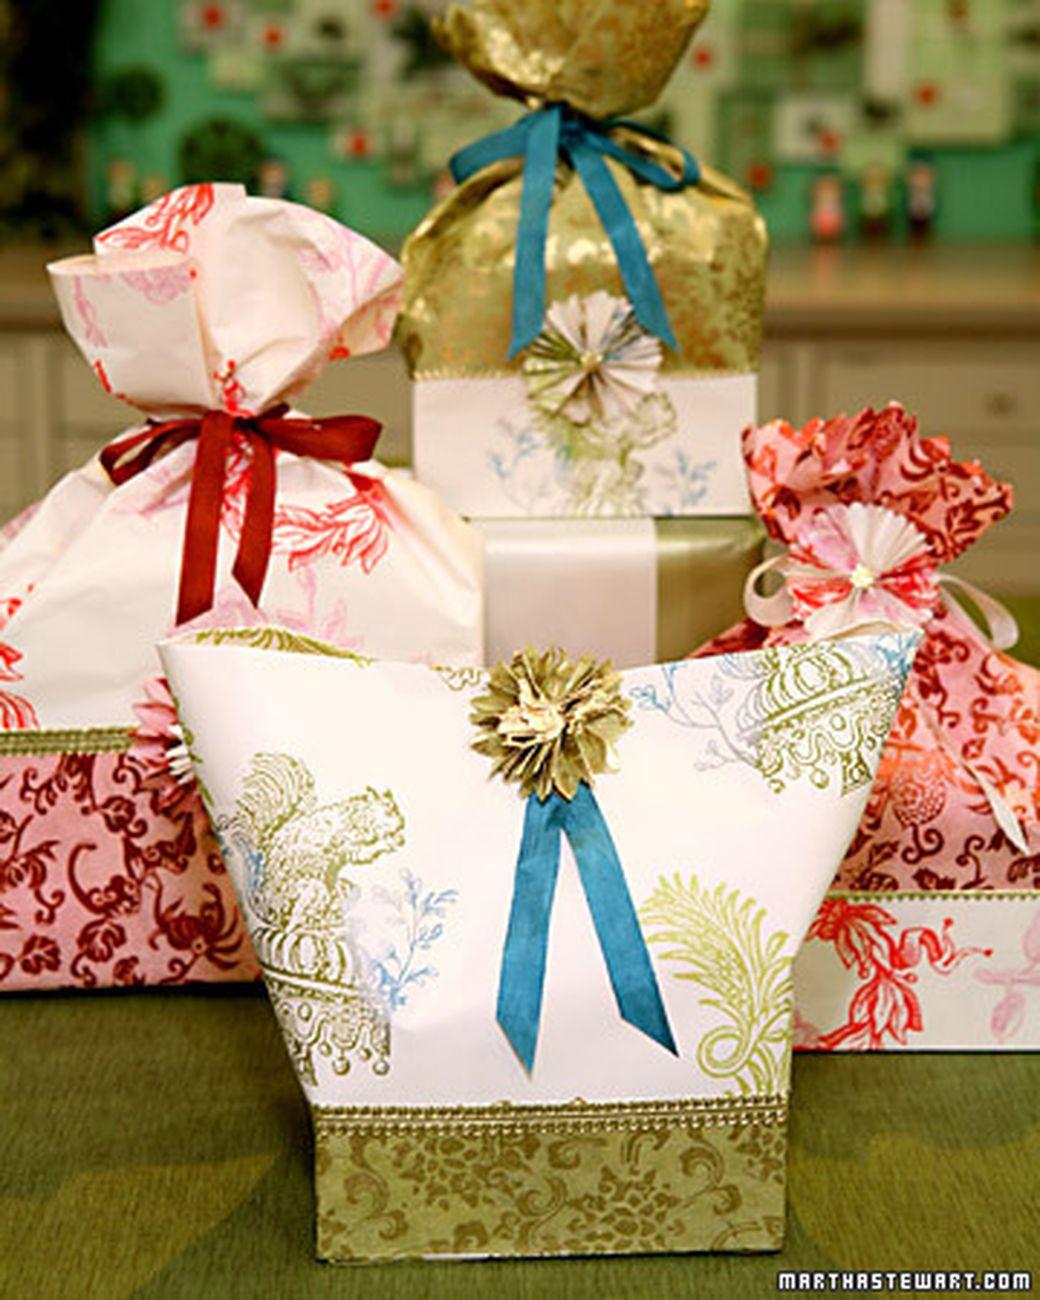 http://assets.marthastewart.com/styles/wmax-520-highdpi/d18/2056_craft_giftbag/2056_craft_giftbag_xl.jpg?itok=VtwVTlol